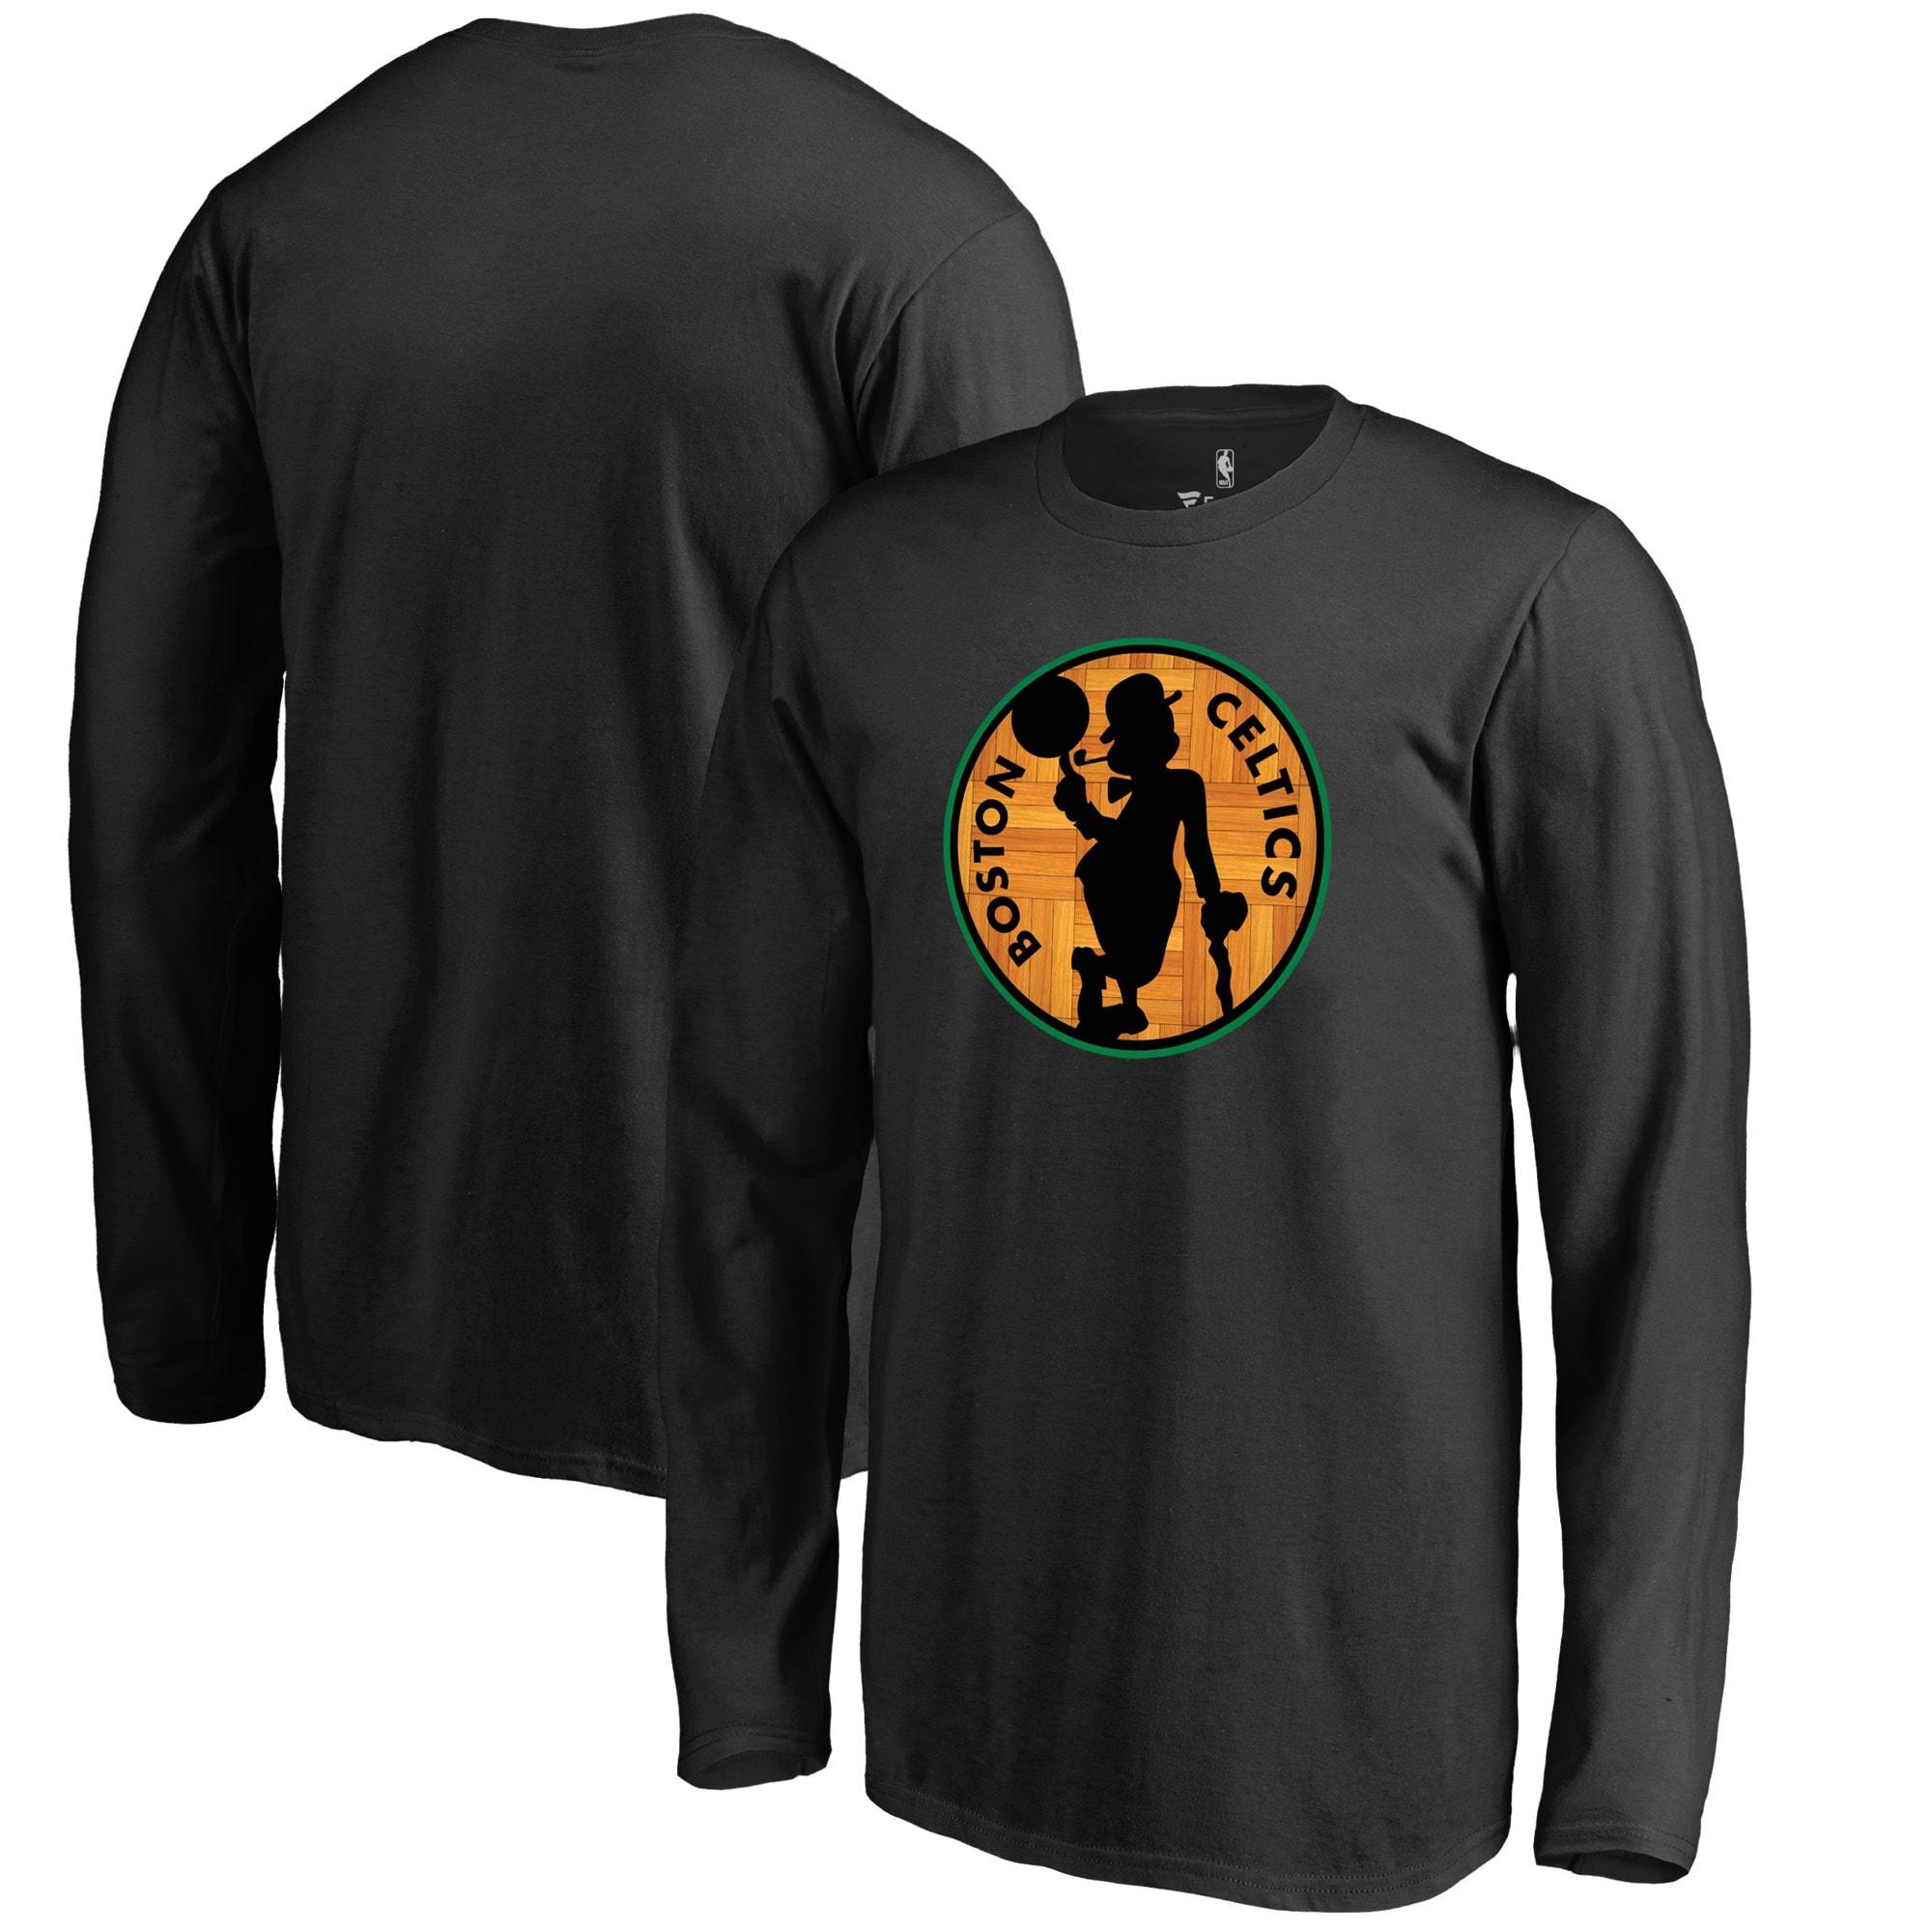 Boston Celtics Fanatics Branded Youth Hardwood Long Sleeve T-Shirt - Black